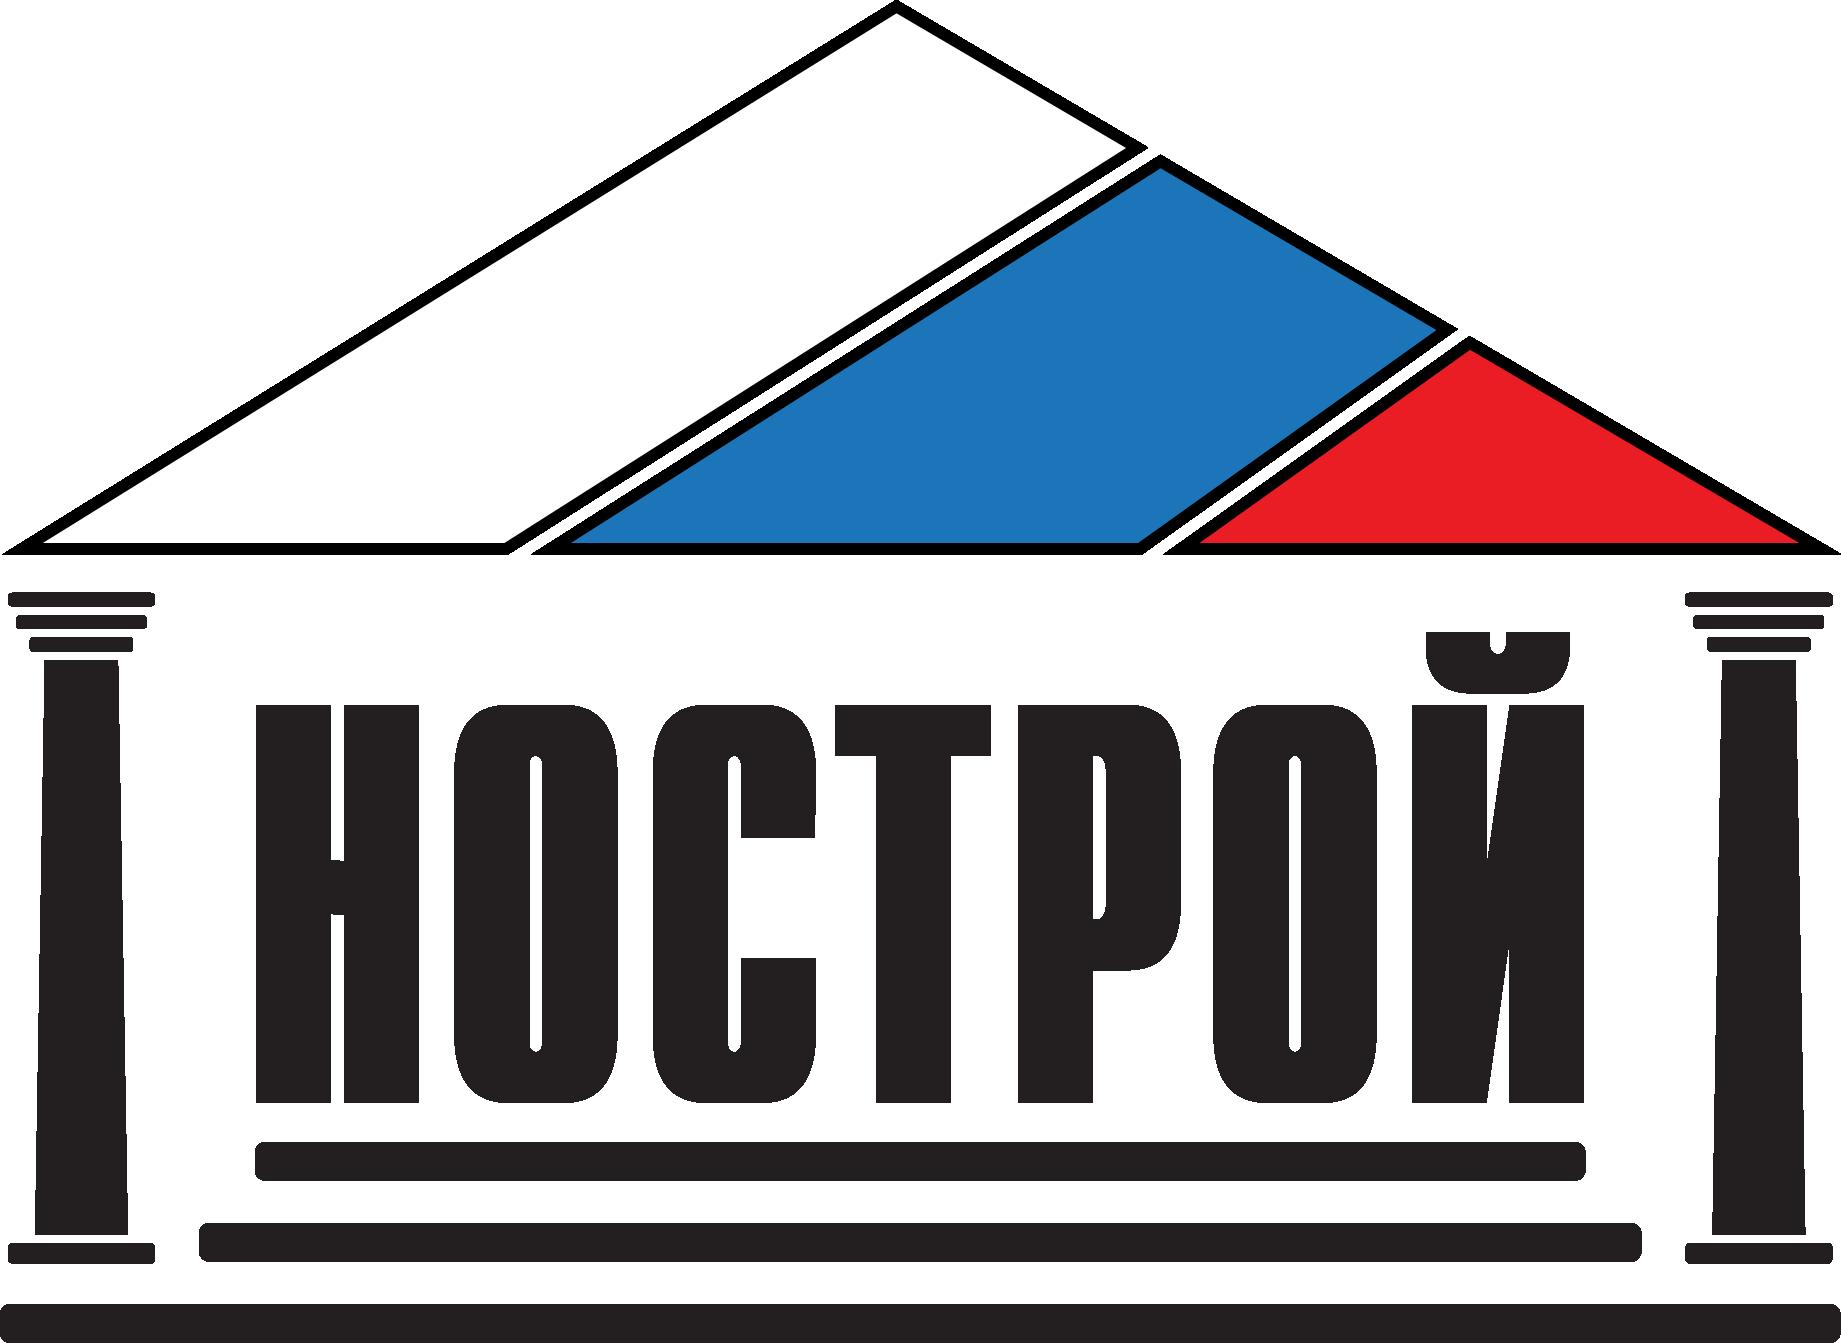 reestr-chlenov-nostroy